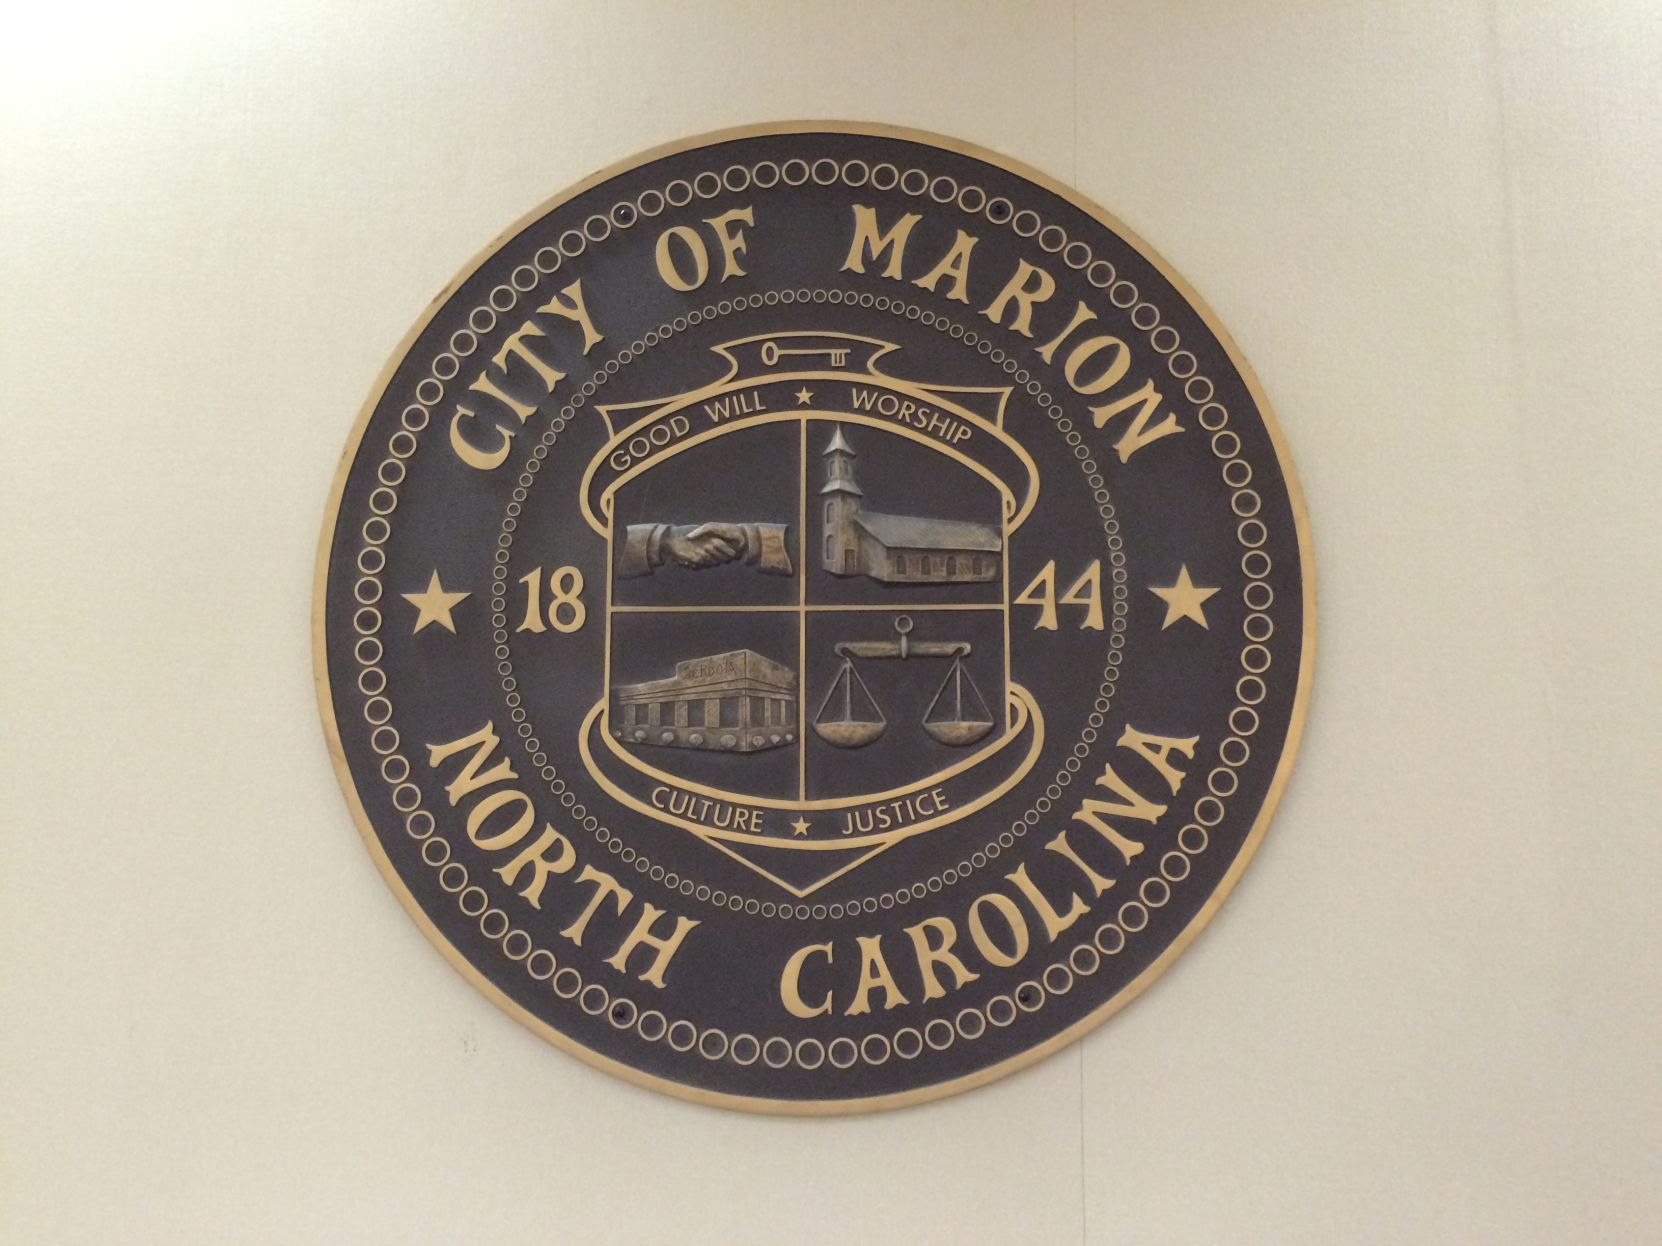 City Council meets Tuesday Agenda lists presentations